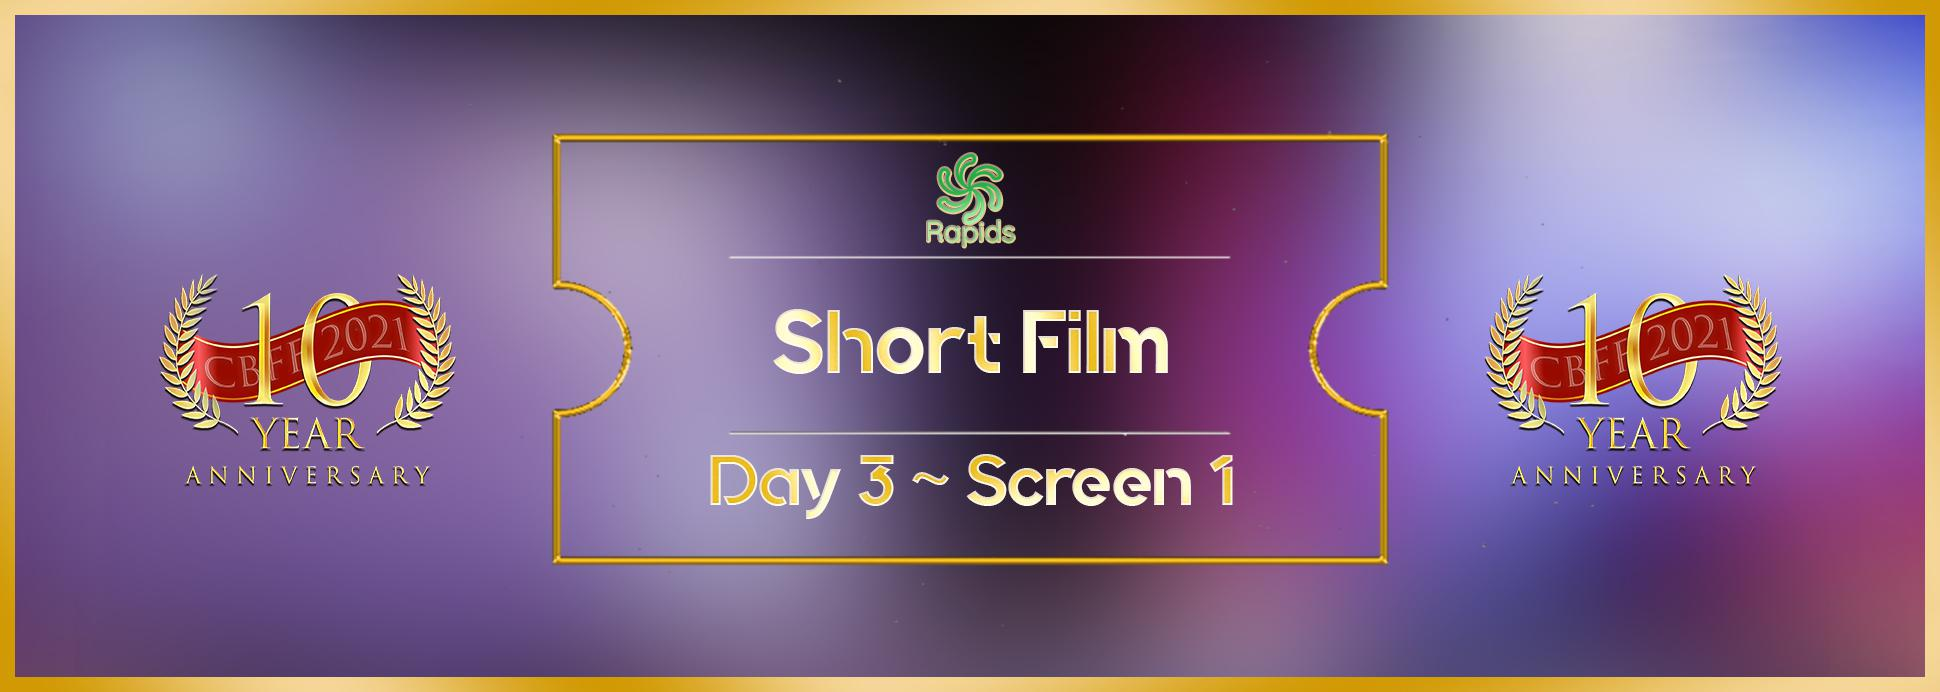 Day 3, Screen 1: Short Film